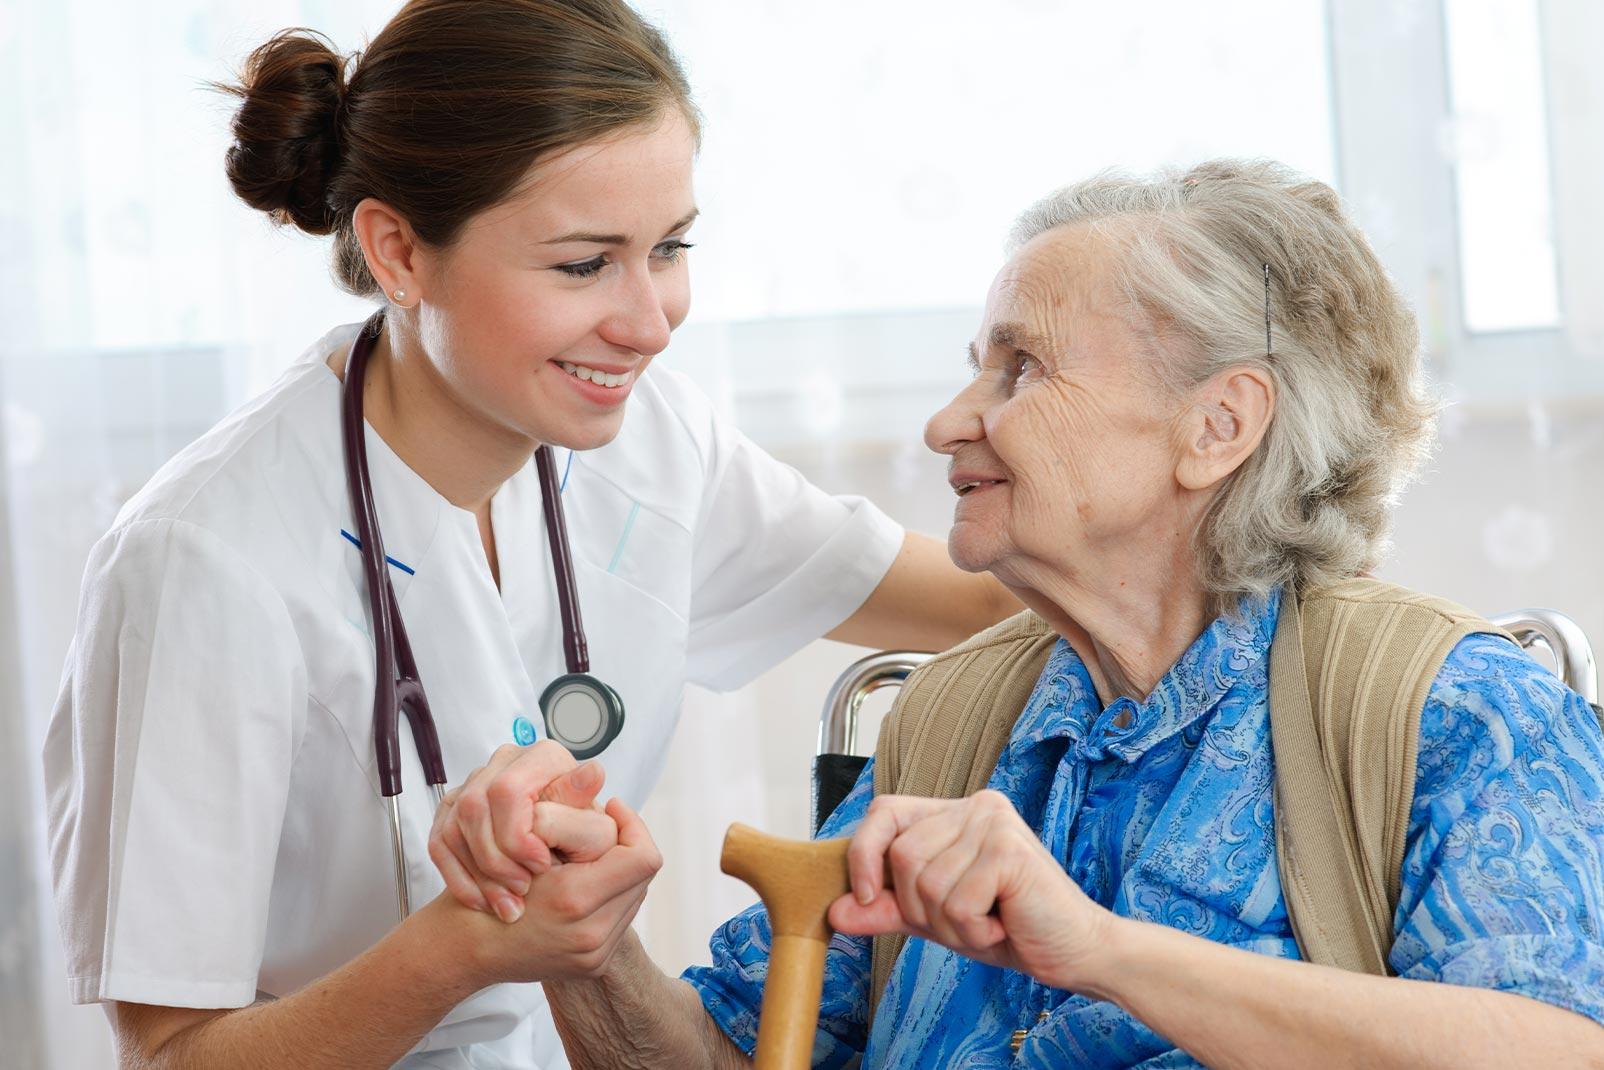 Pflegerin mit Stetoskop hält ältere Frau